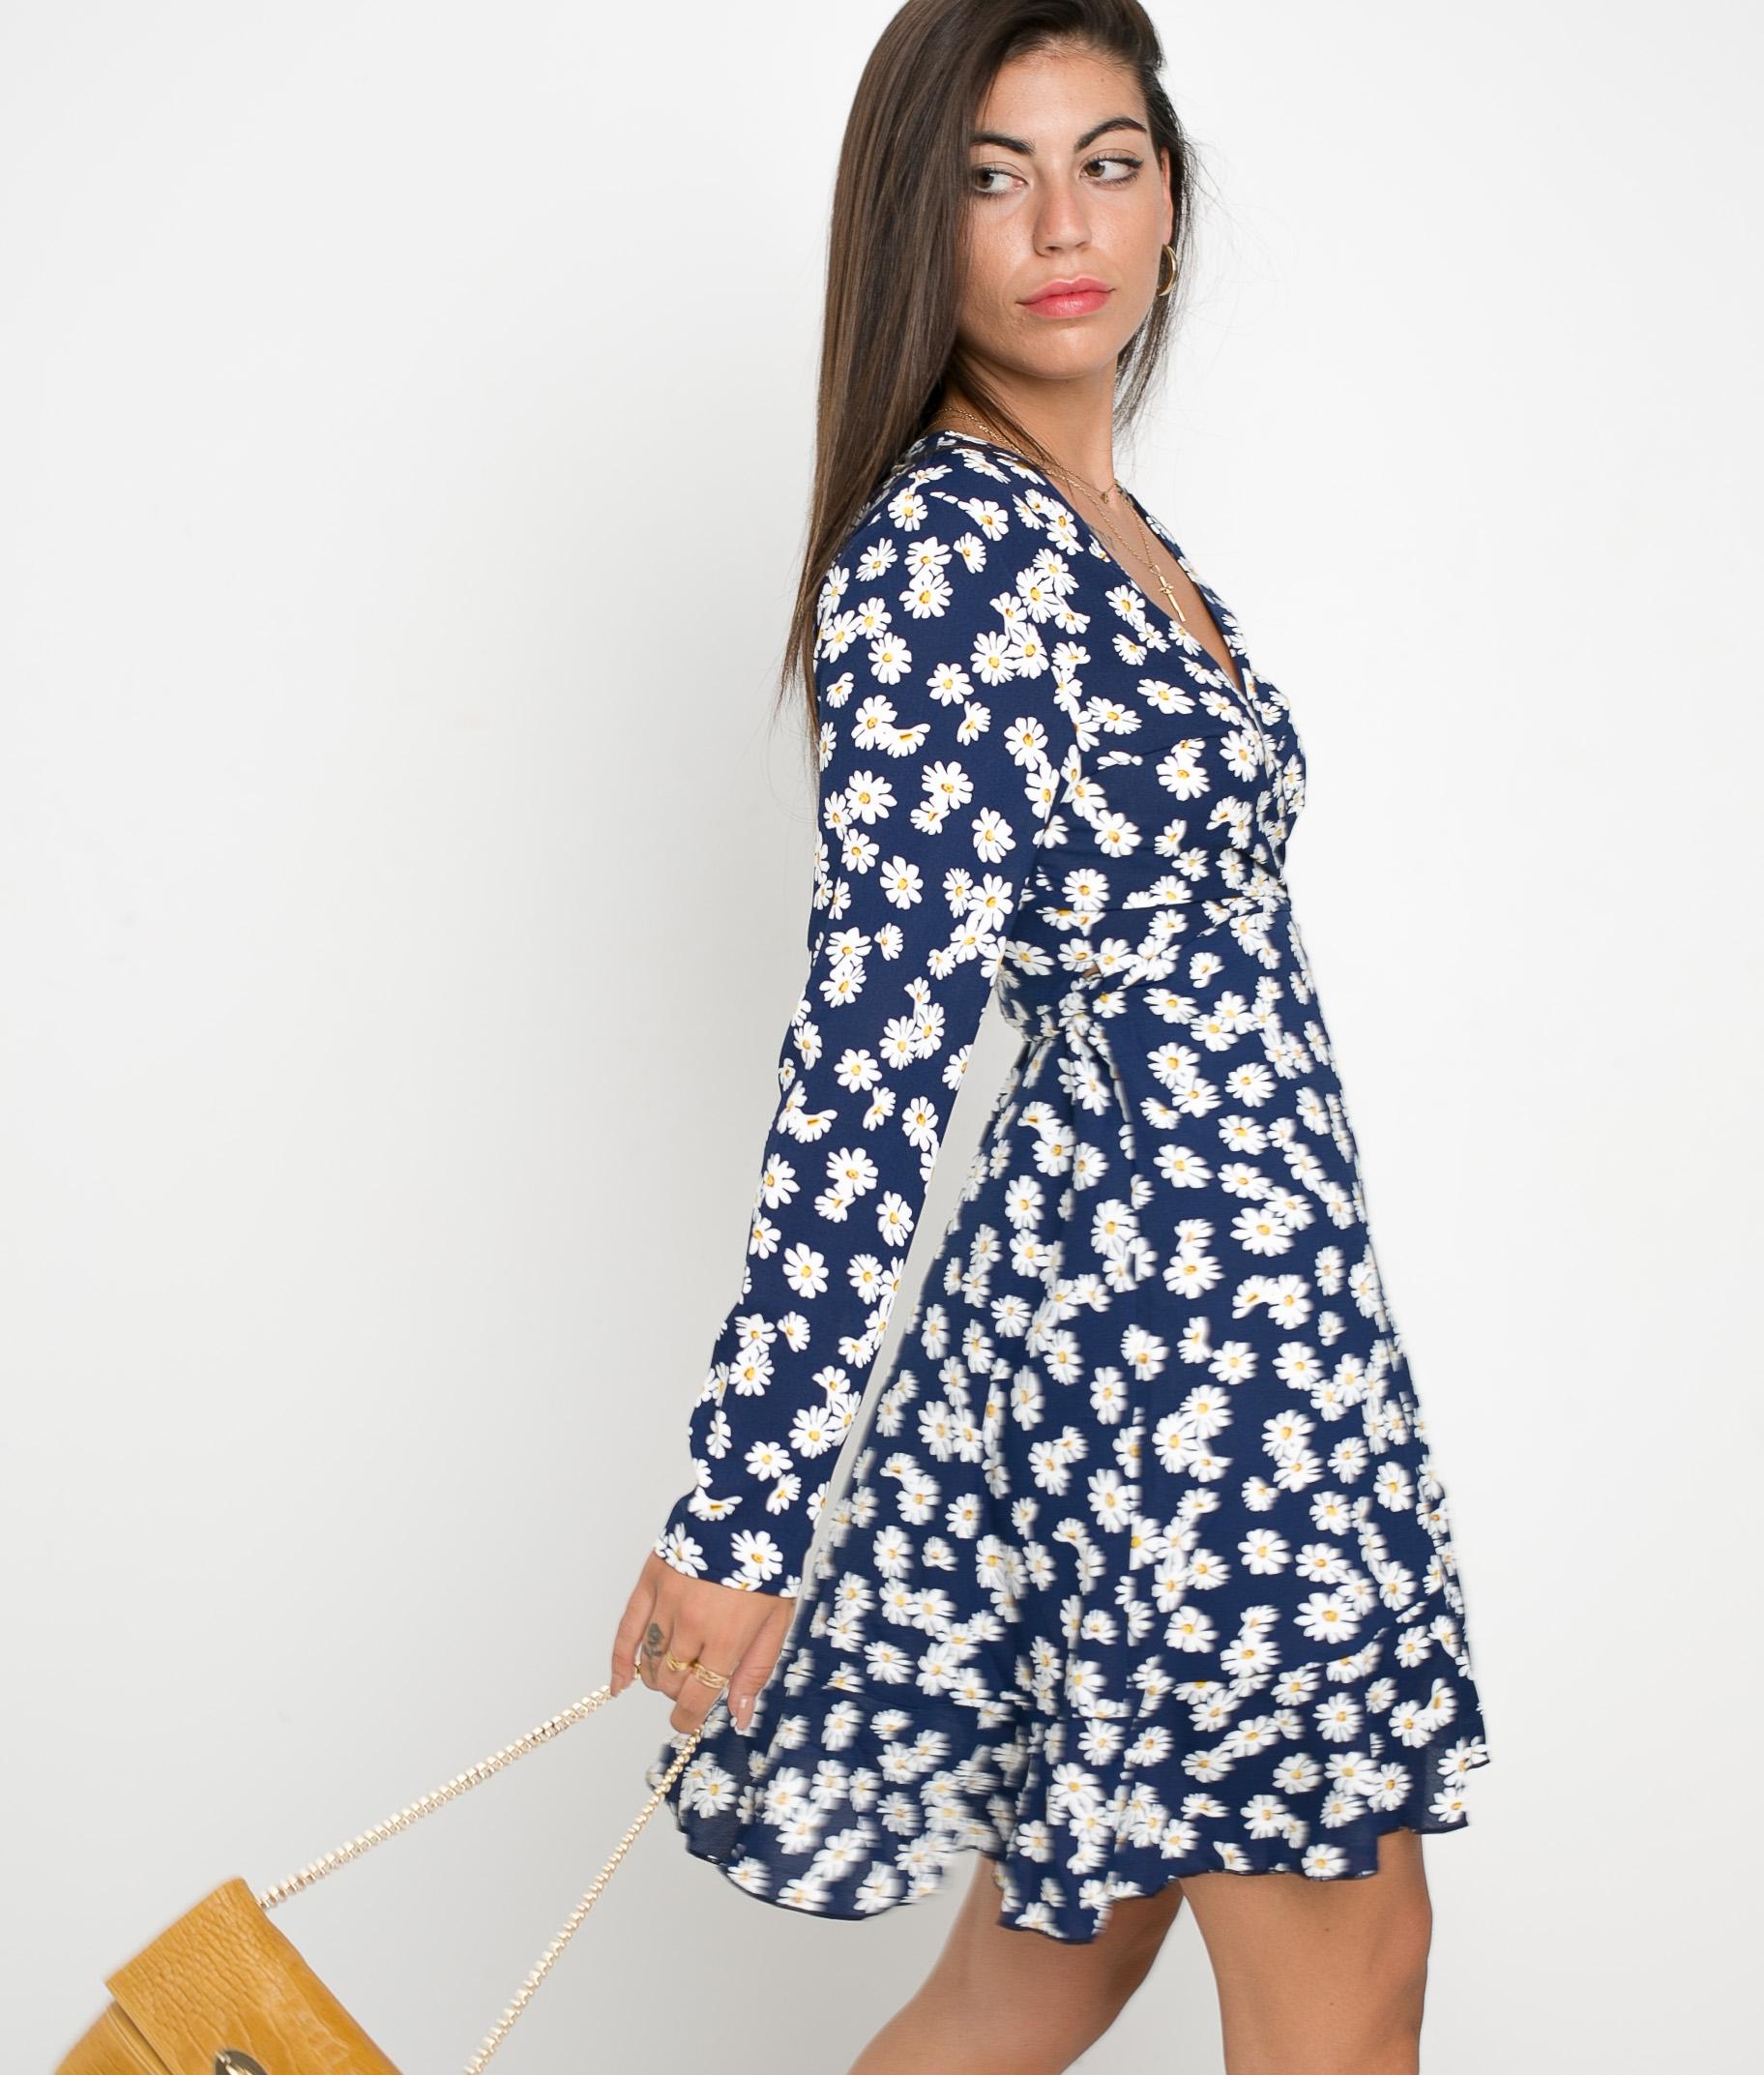 DRESS TAMIRA - BLUE